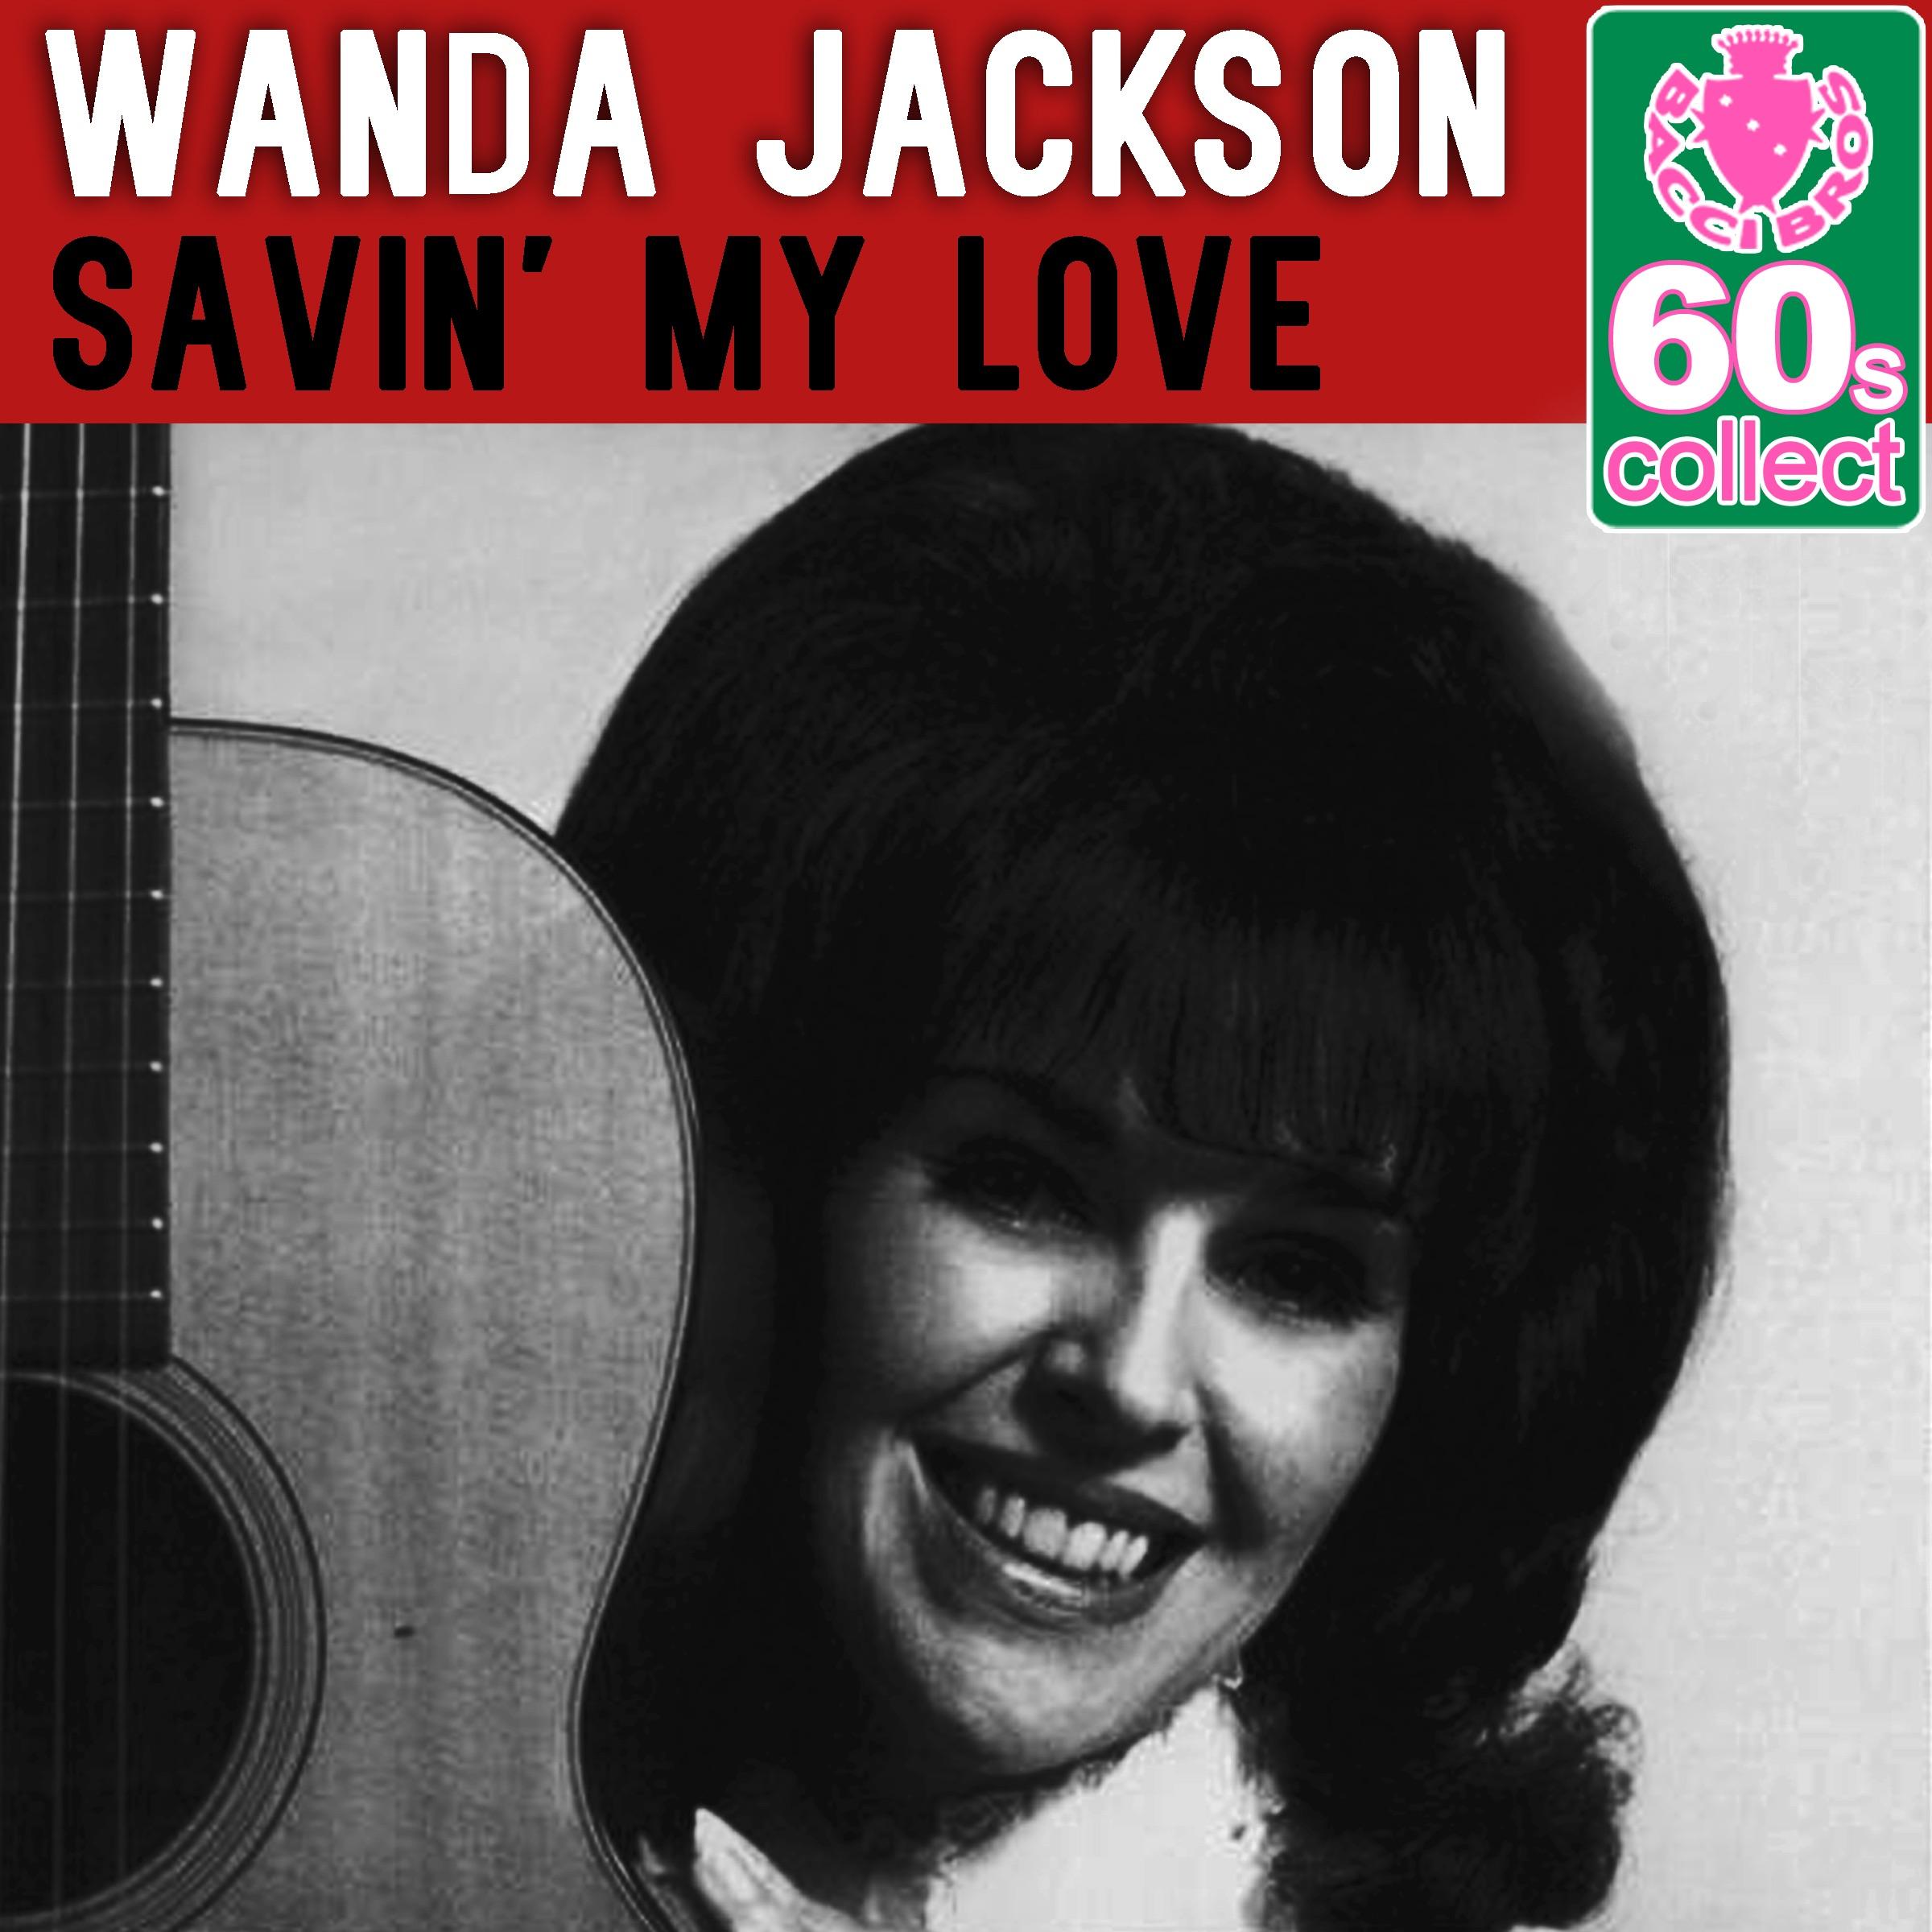 Savin' My Love (Remastered) - Single